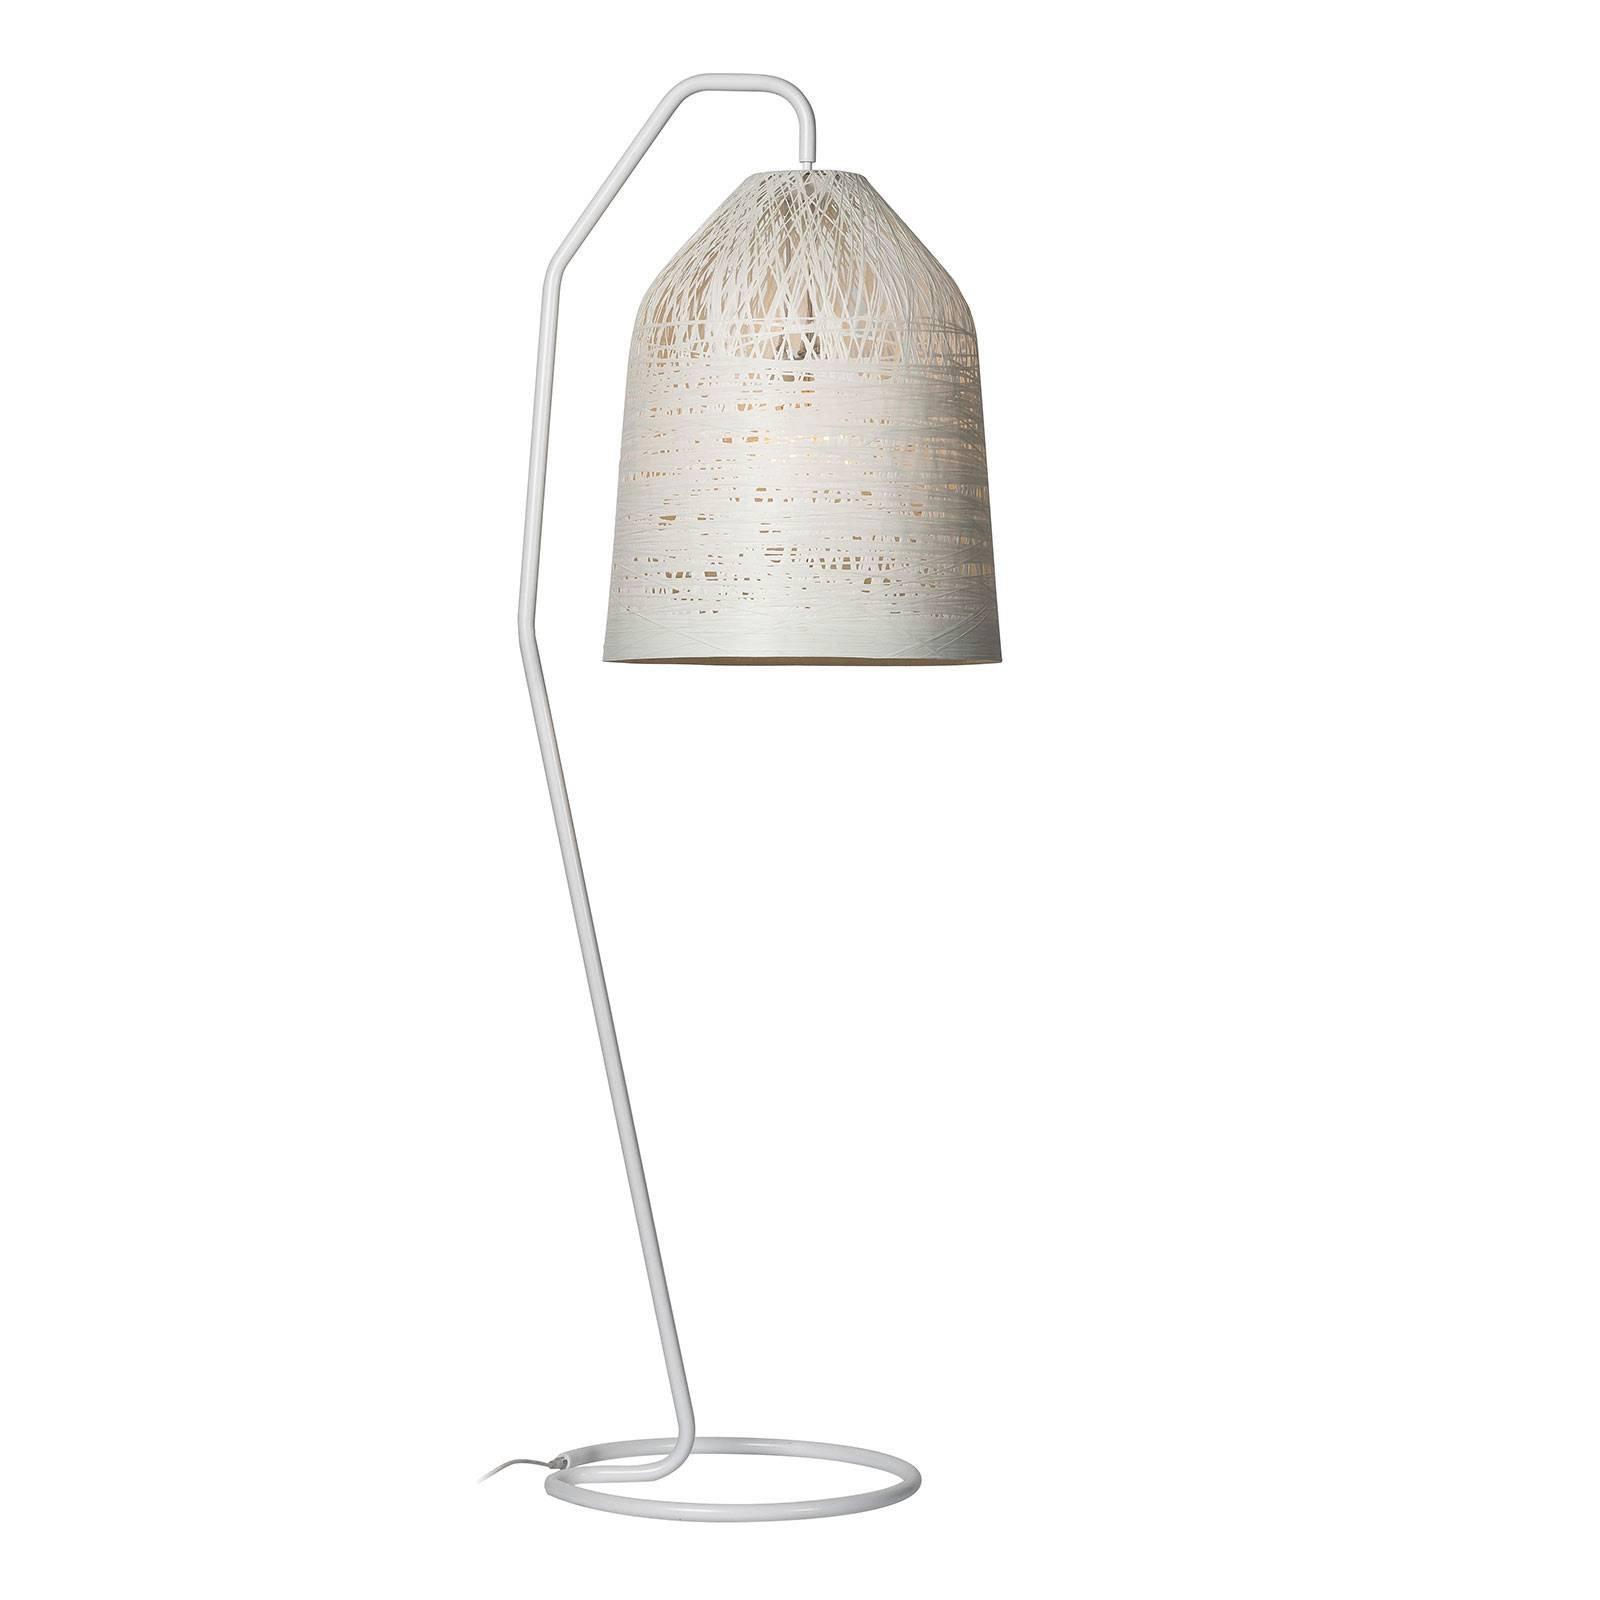 Karman Black Out gulvlampe høyde 180cm hvit